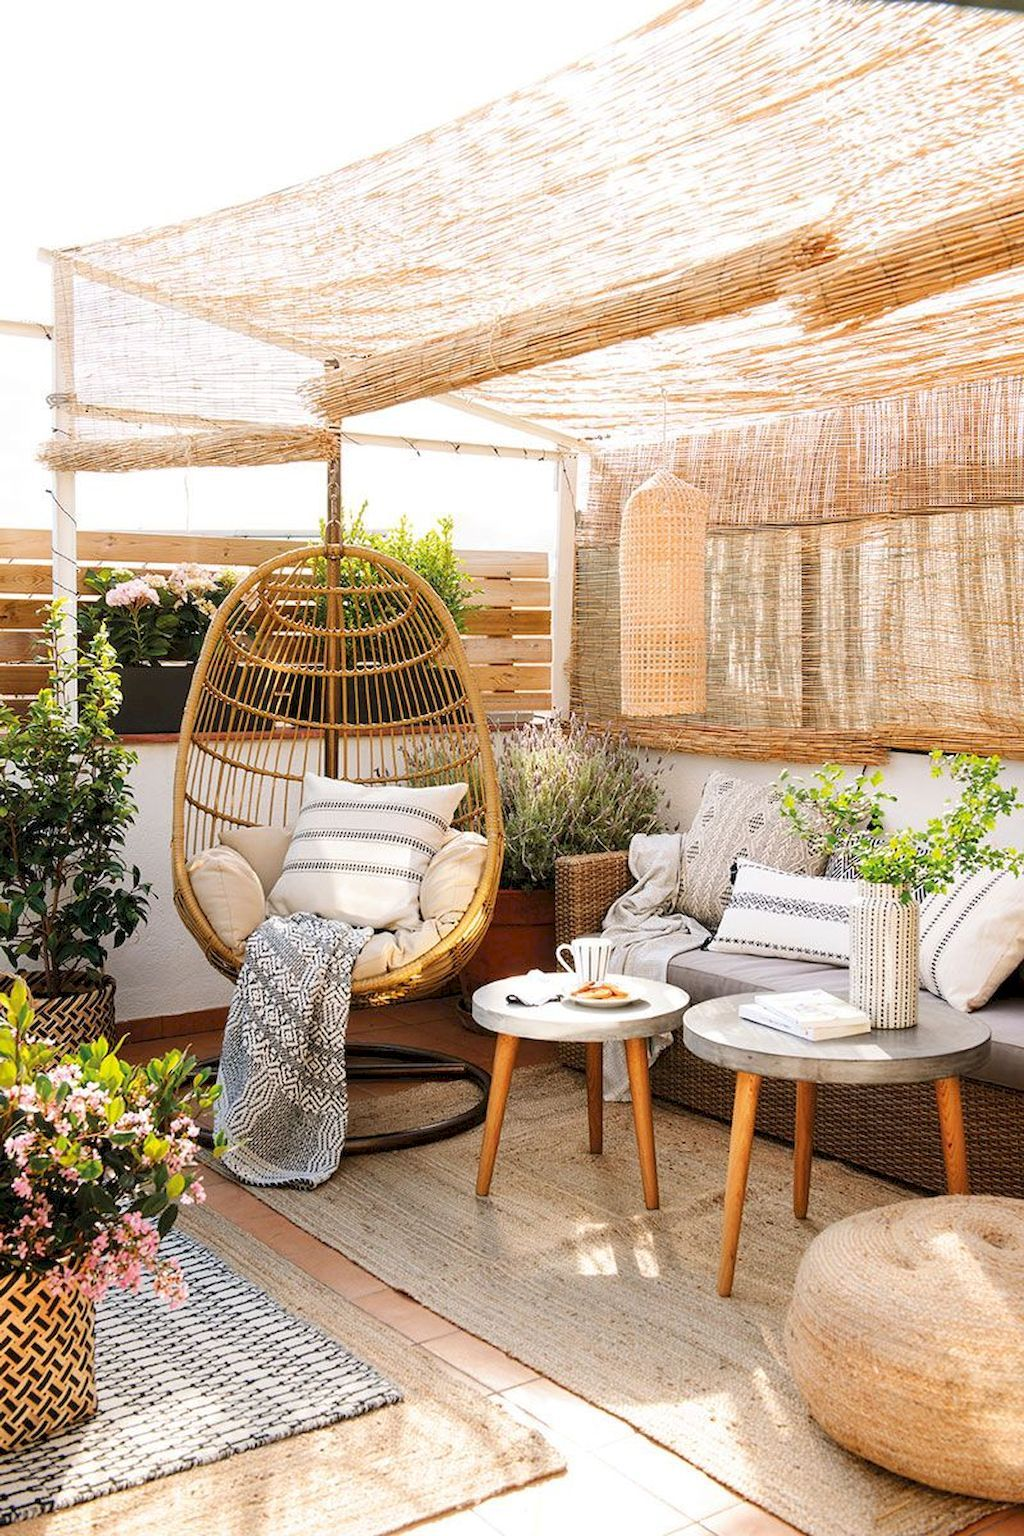 71 Wonderful Outdoor Patio Ideas Oneonroom Boho Patio Patio